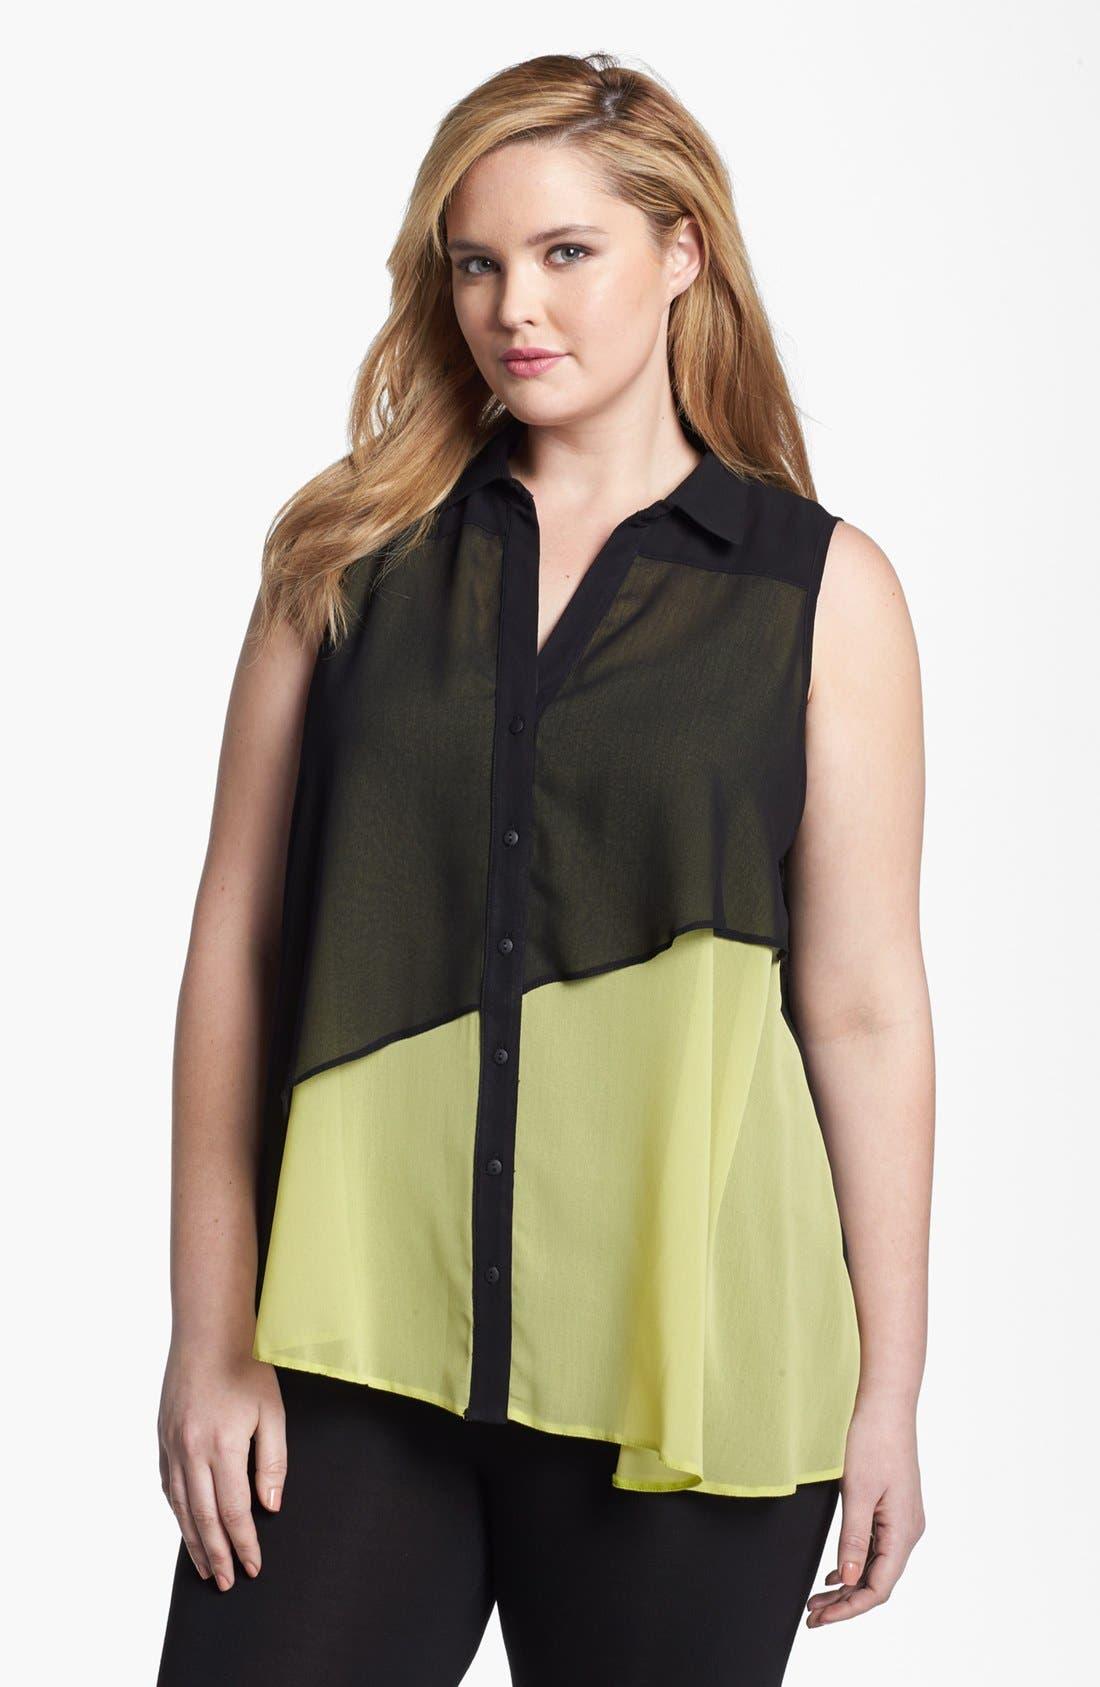 Alternate Image 1 Selected - Evans Sleeveless Layered Chiffon Blouse (Plus Size)